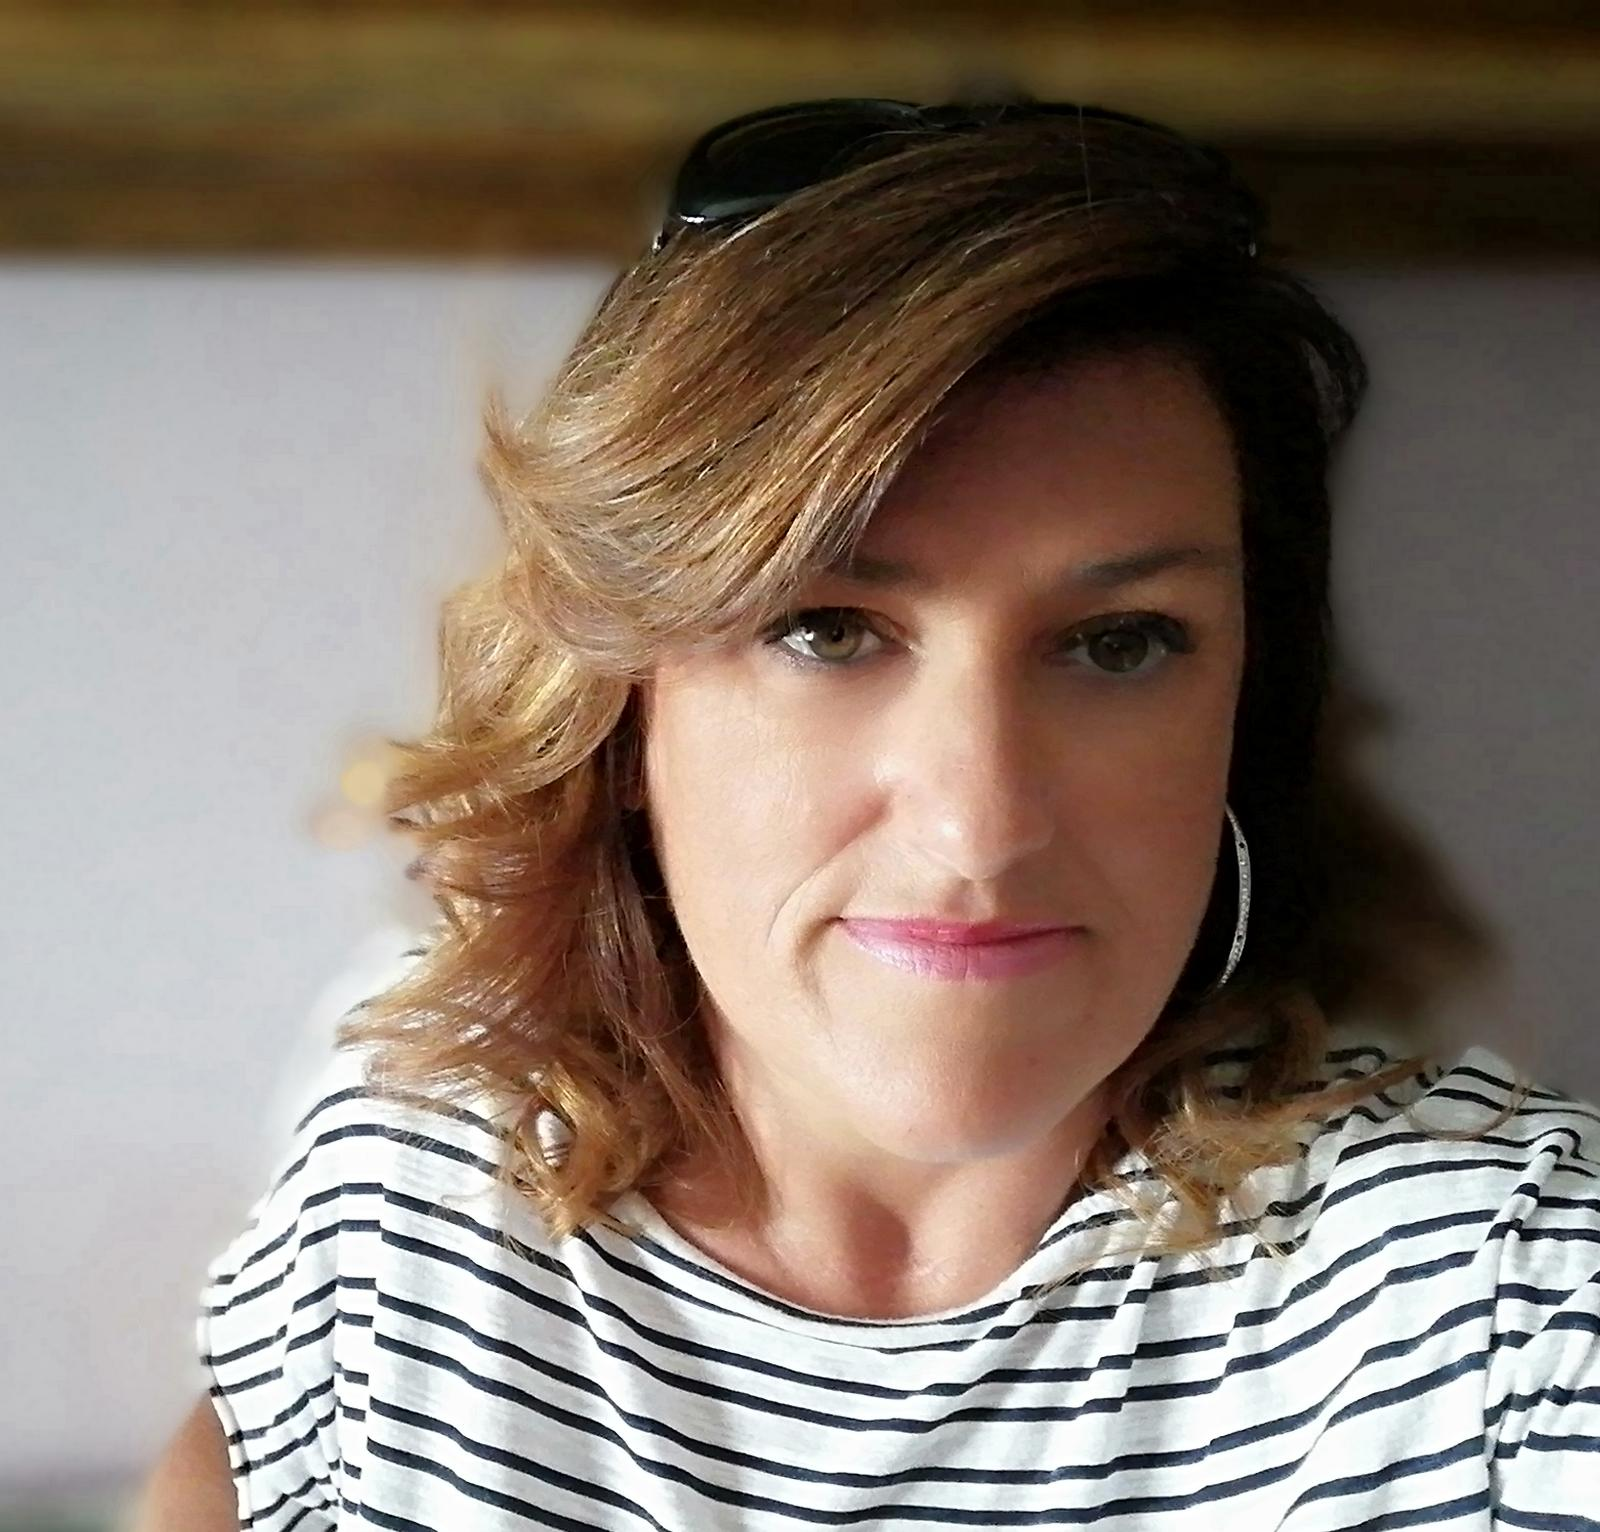 Veronica Ruggiero